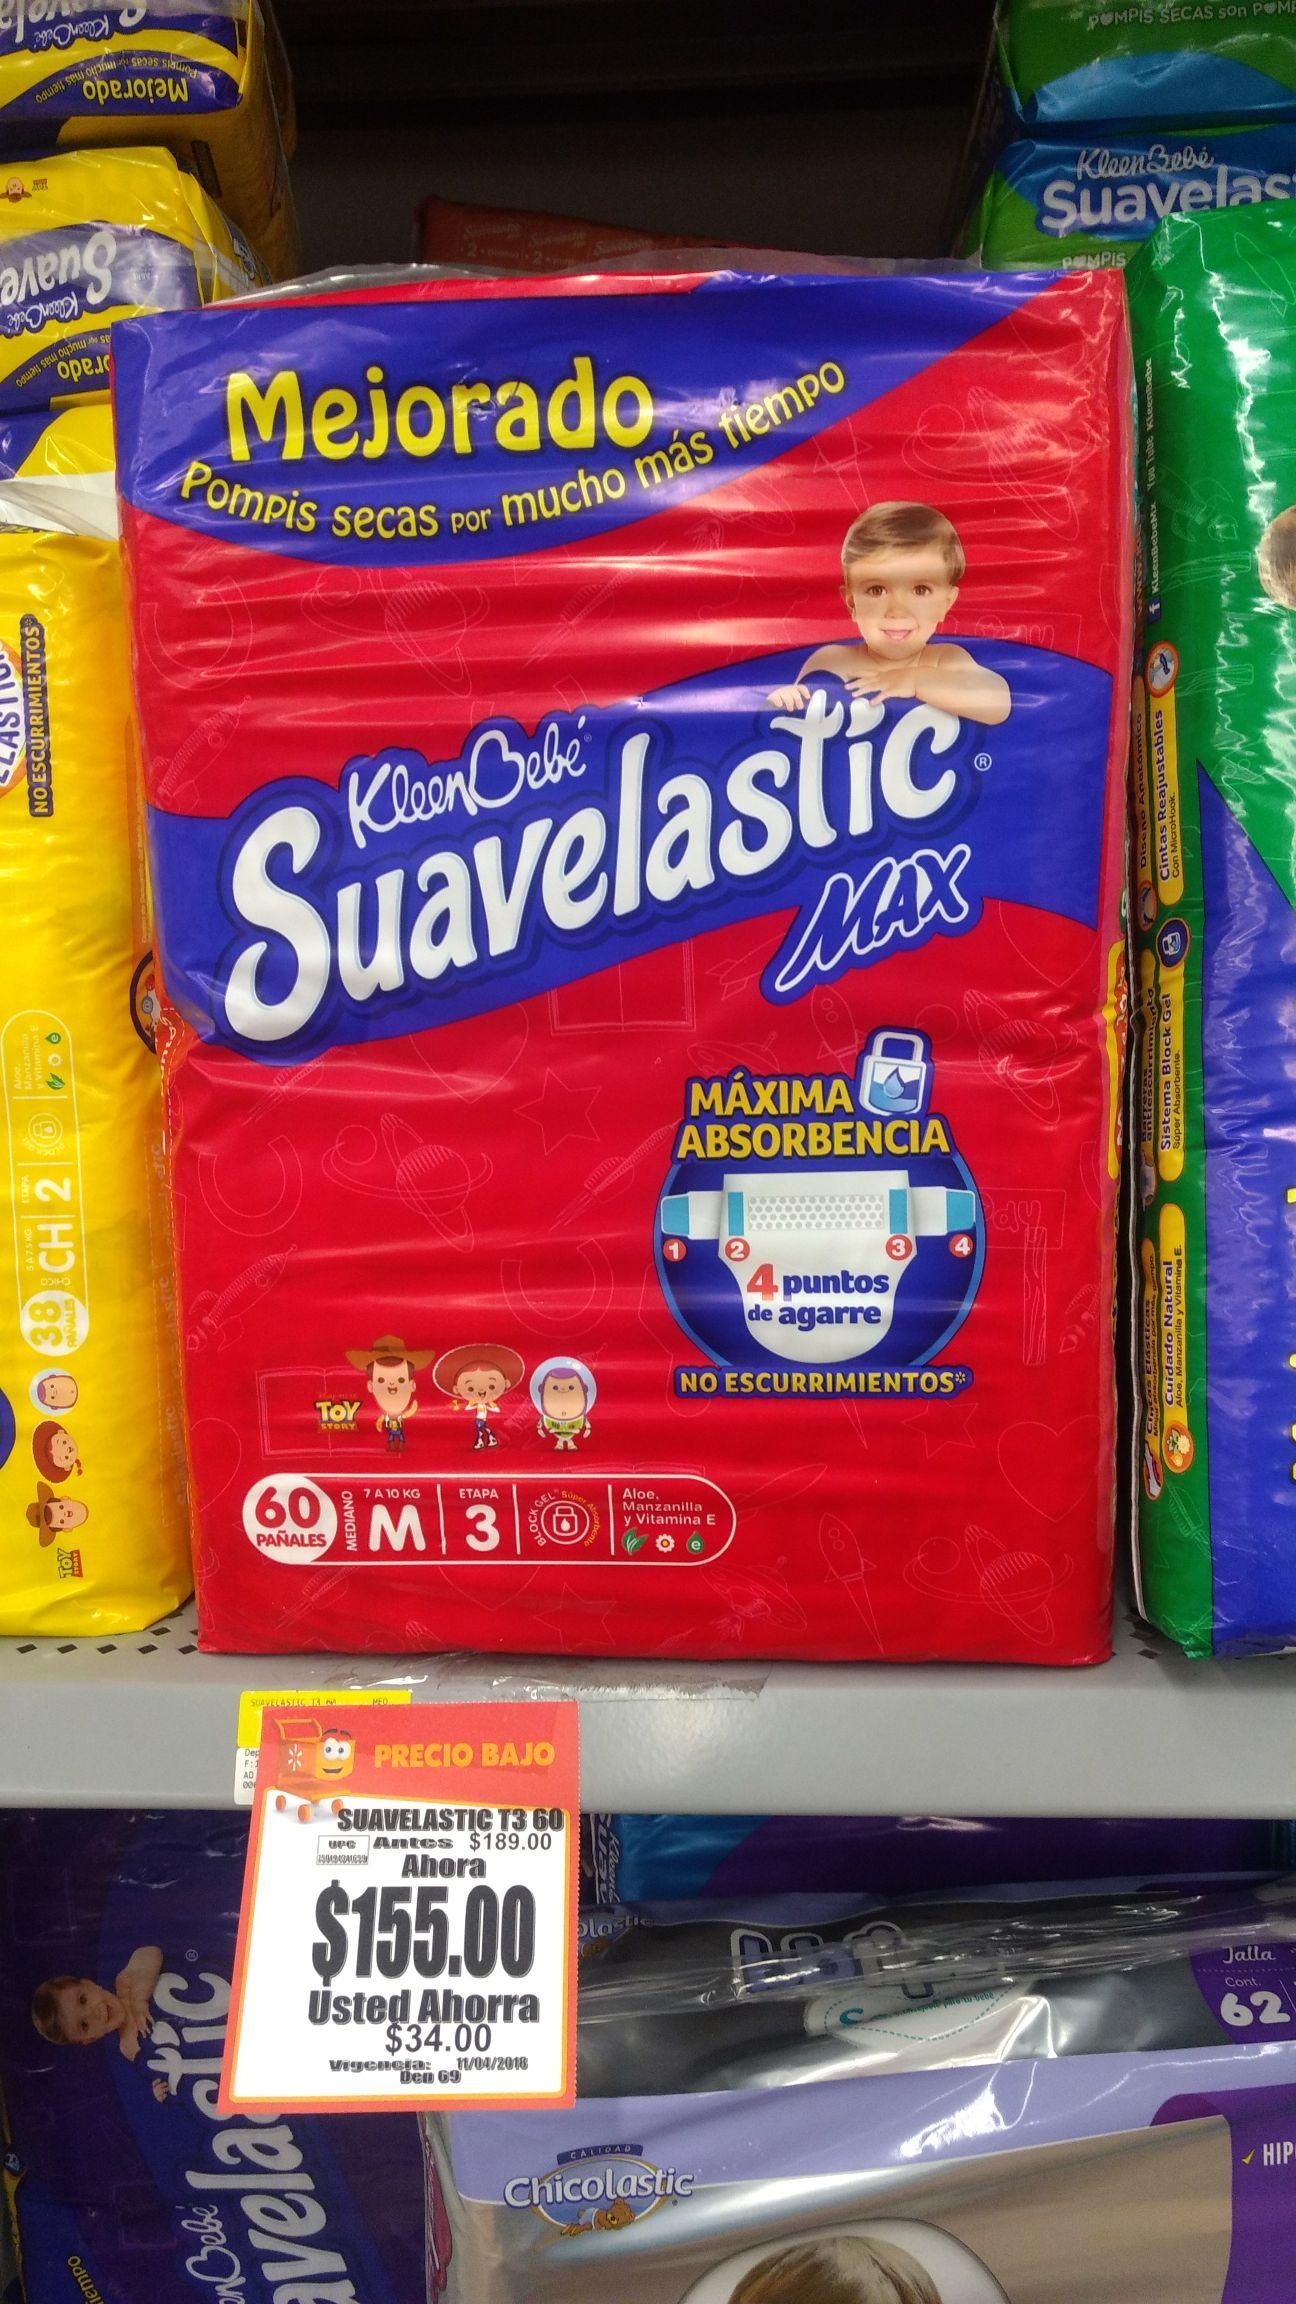 Walmart: Pañales Suavelastic Mediano Etapa 3